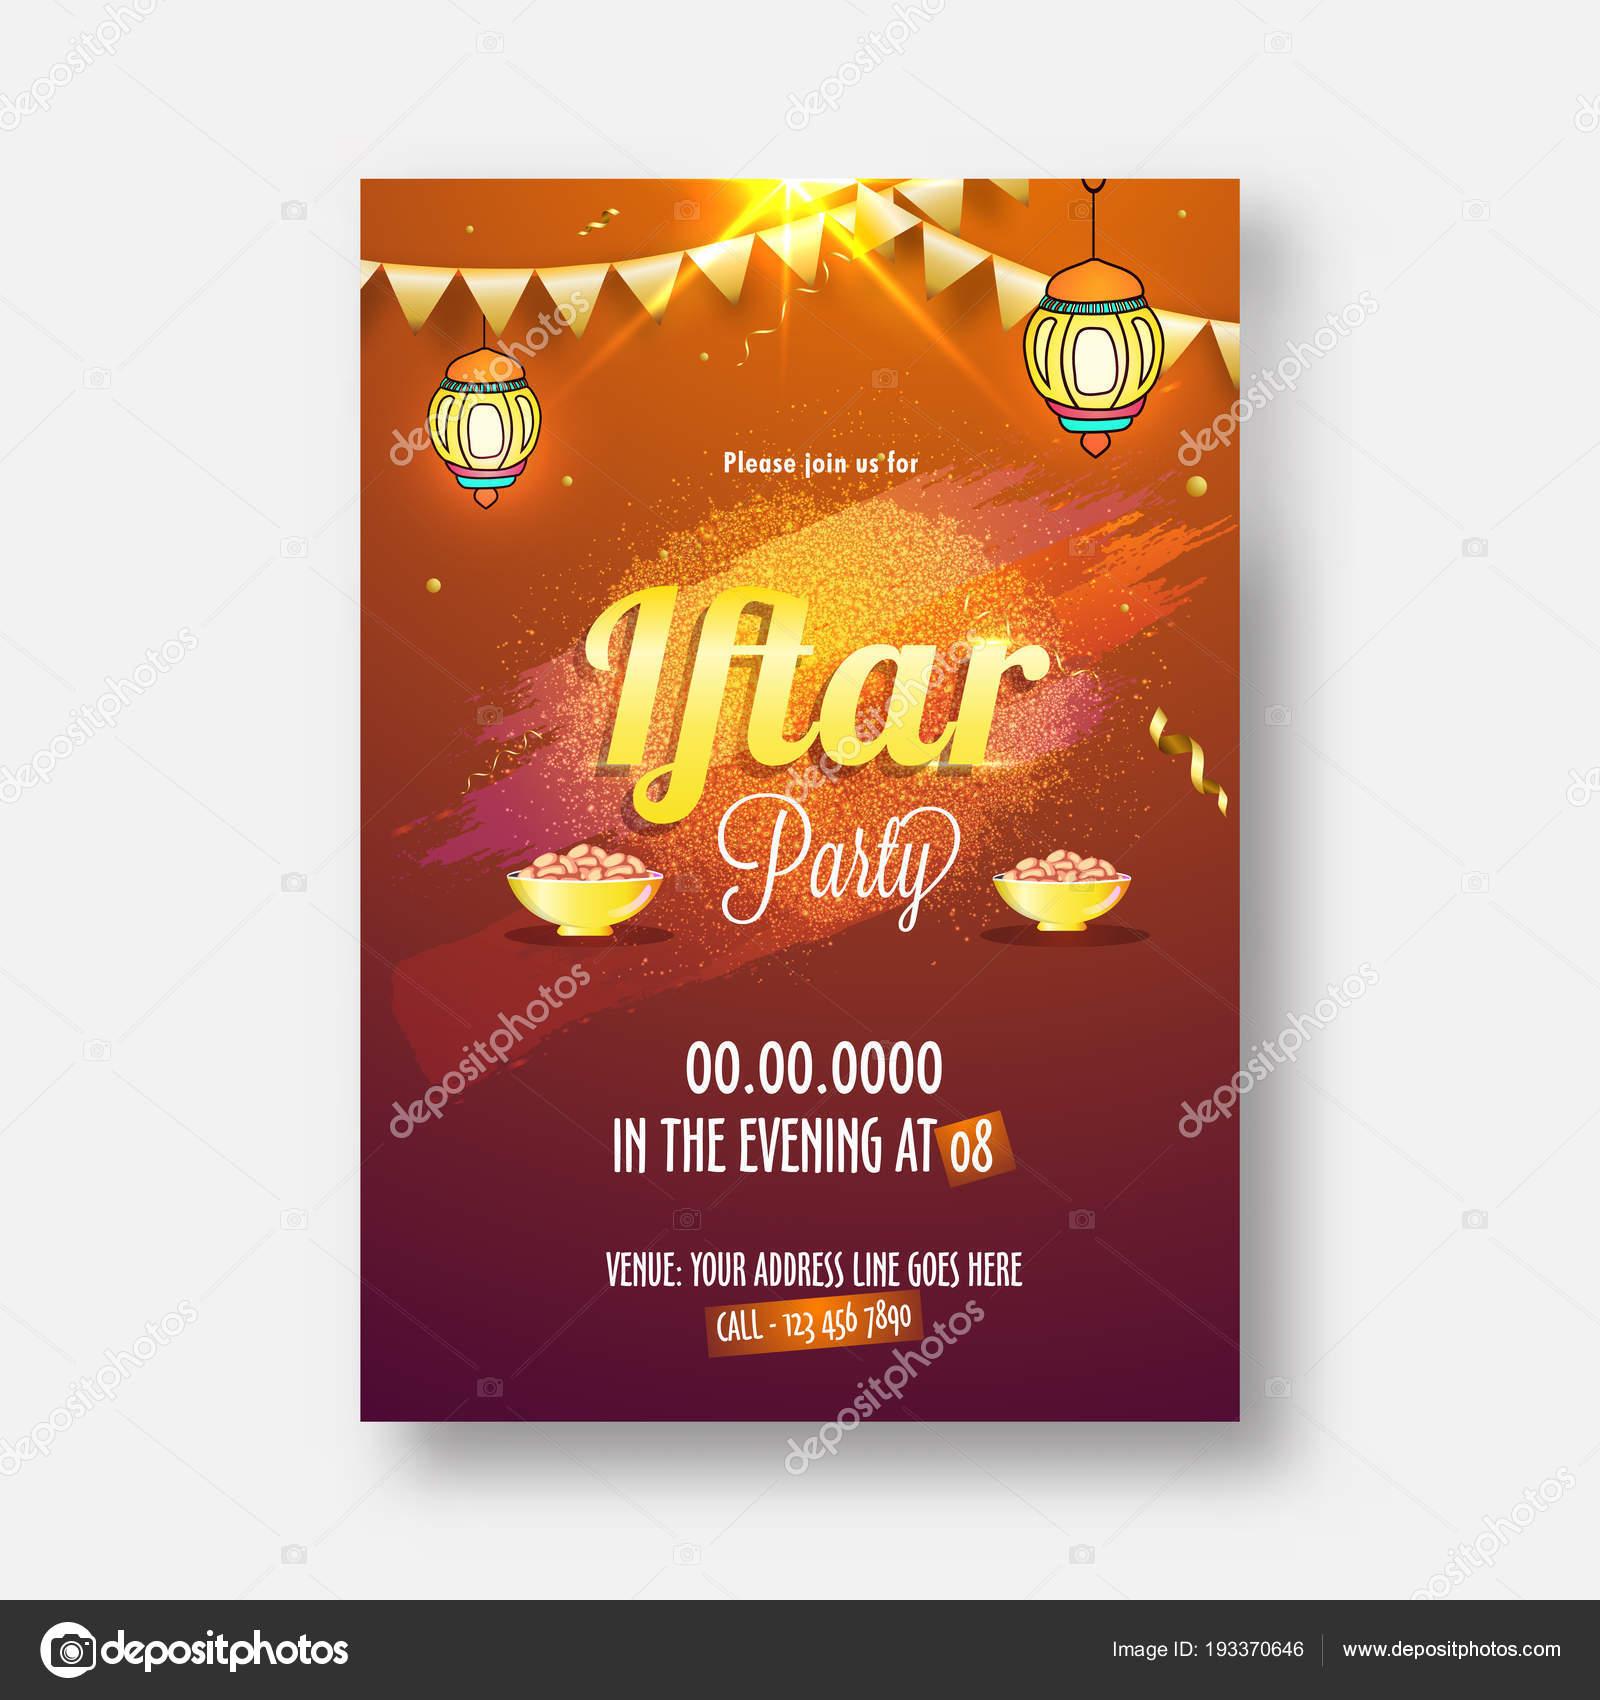 Iftar Party celebration, invitation card design with stylish golden ...